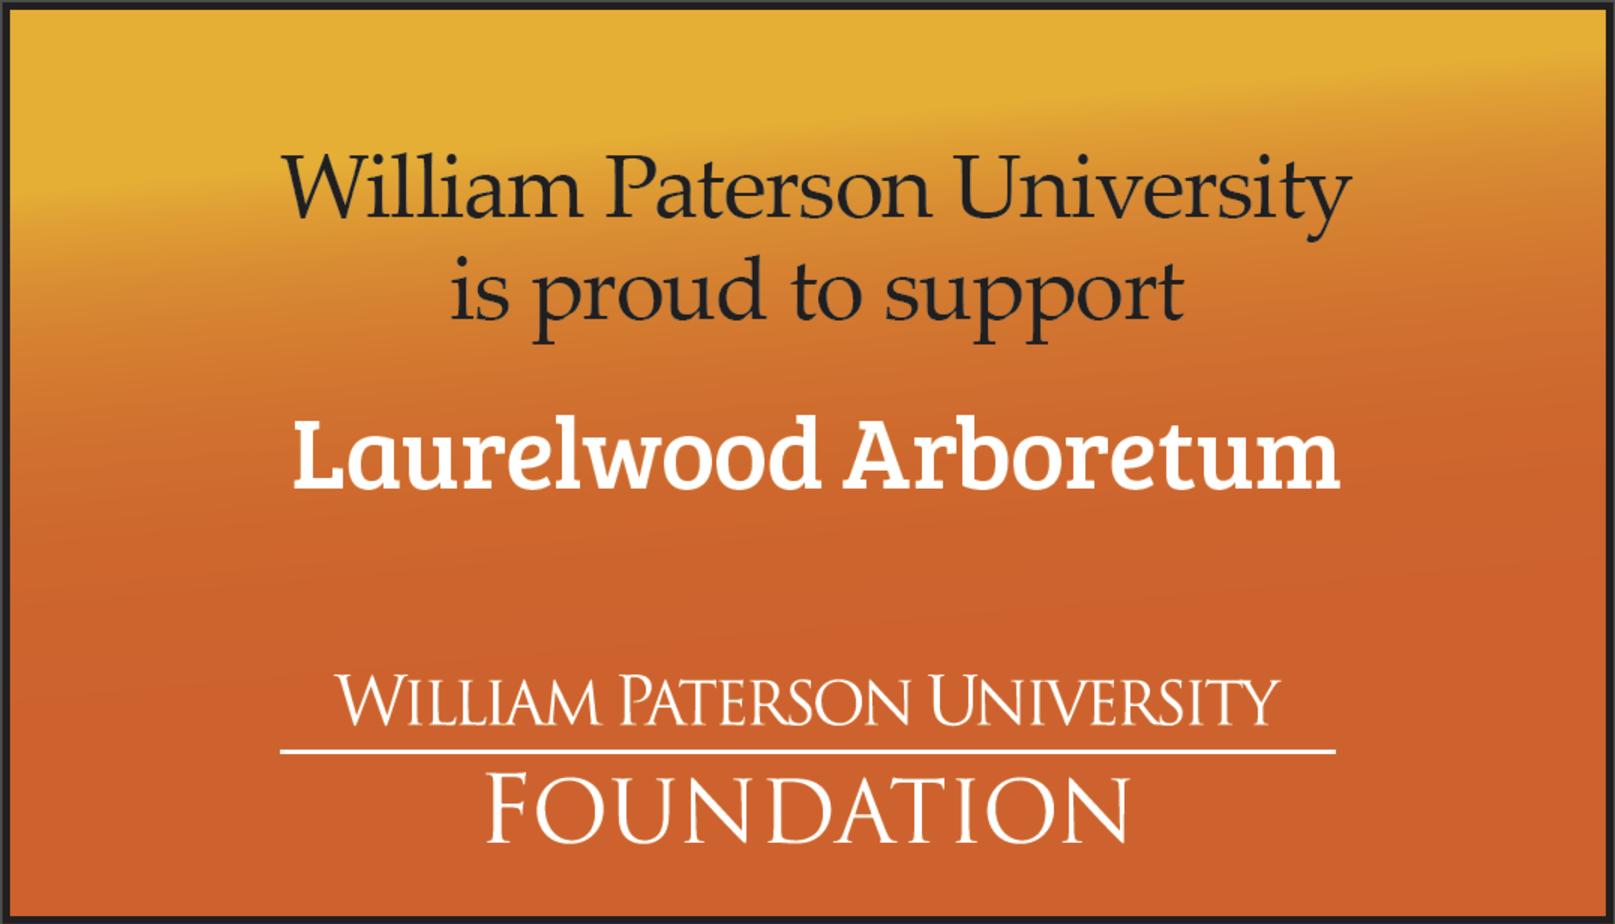 William Paterson University Foundation